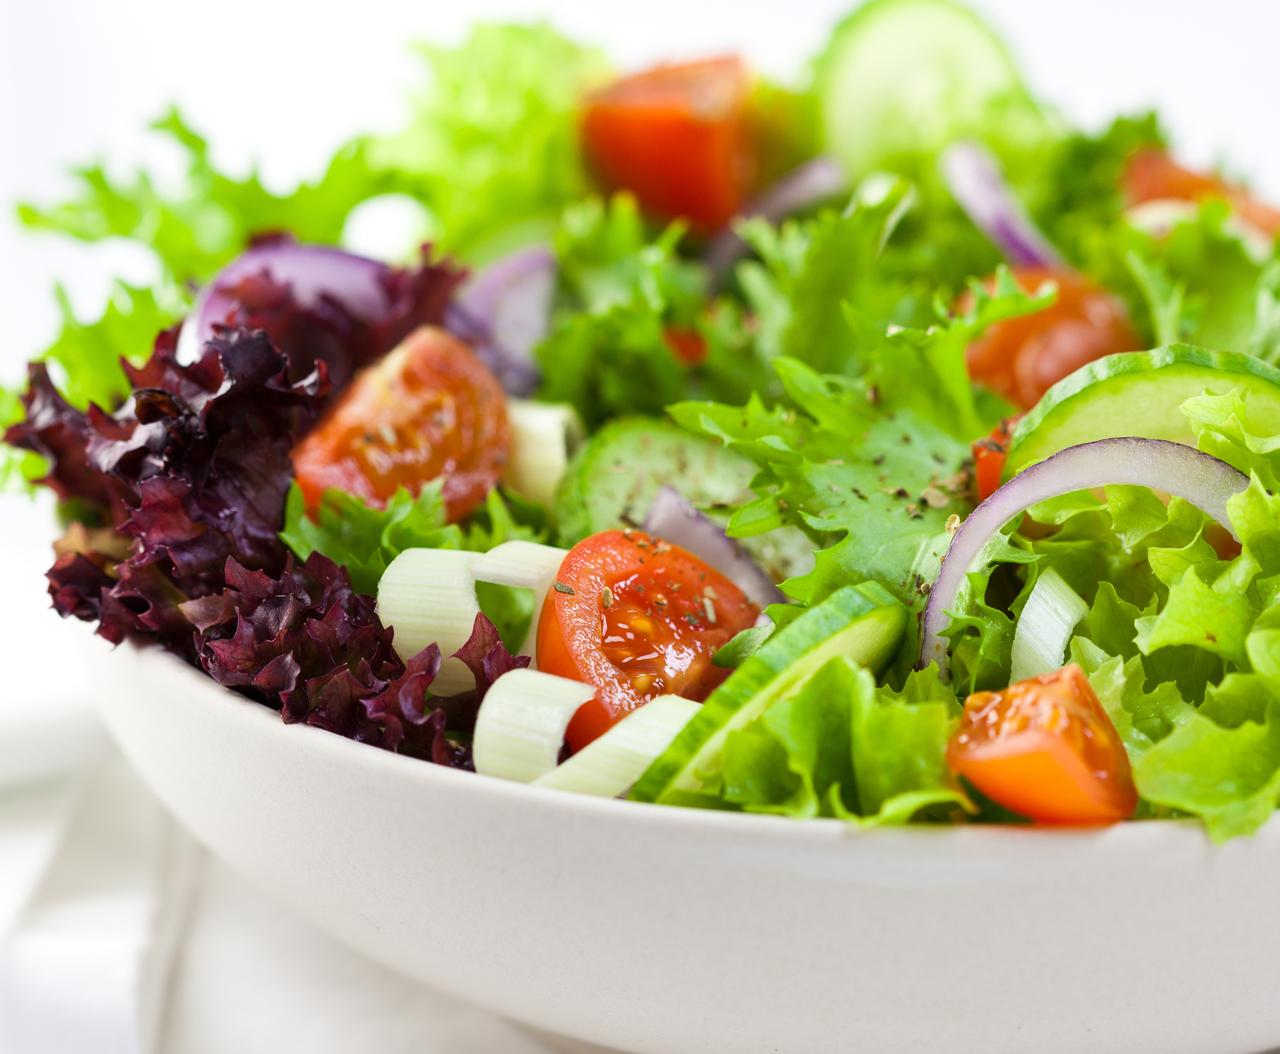 Salad-white-plate-6069_large